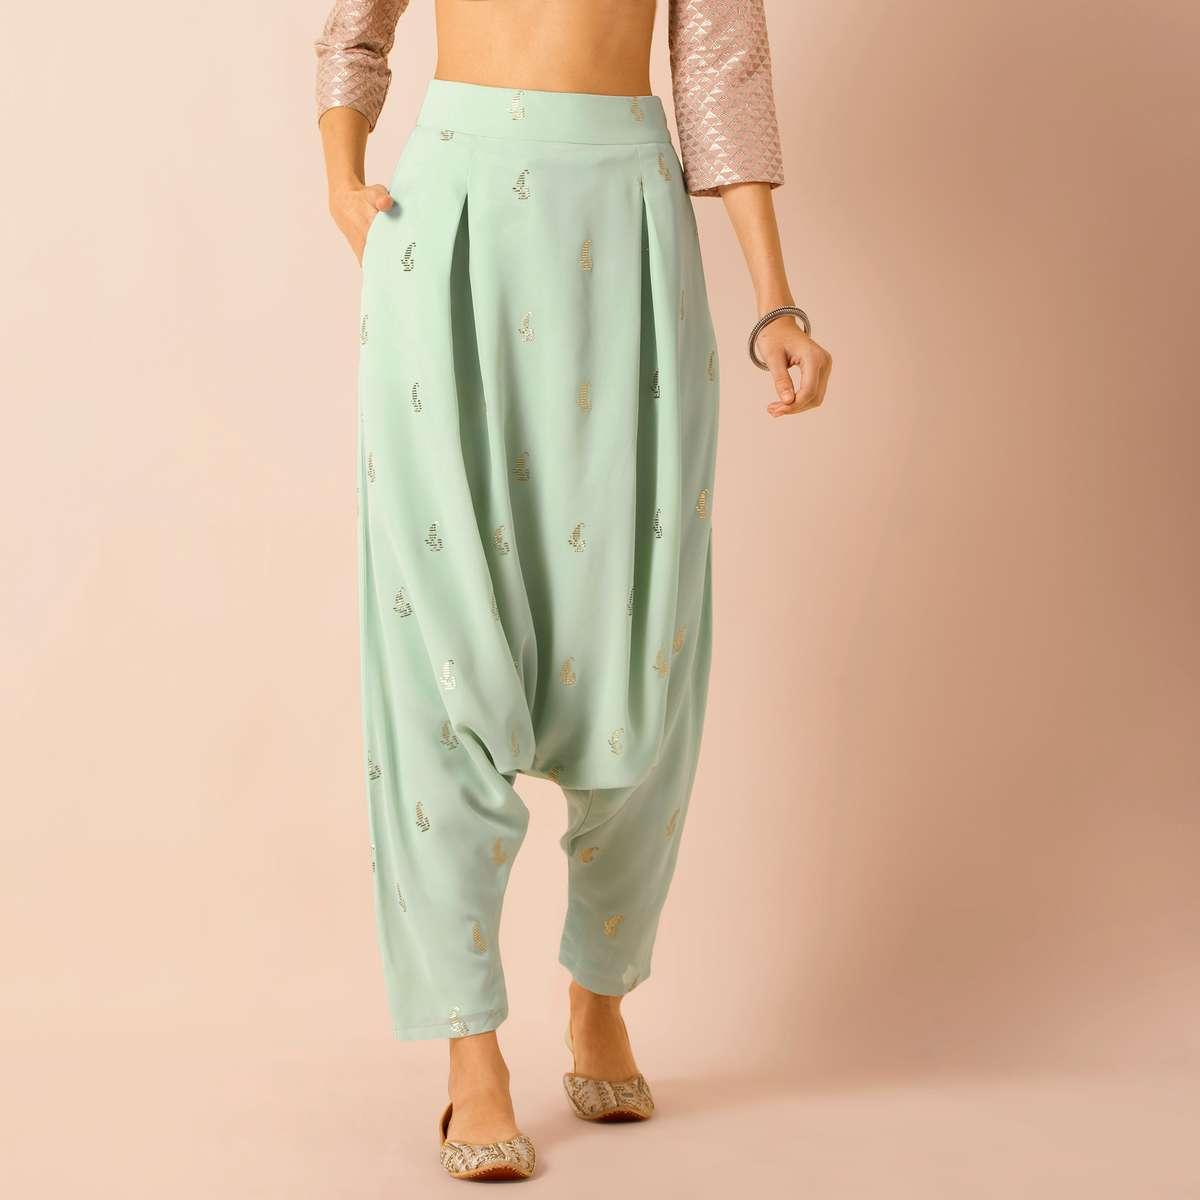 4.INDYA Women Embroidered Dhoti Pants